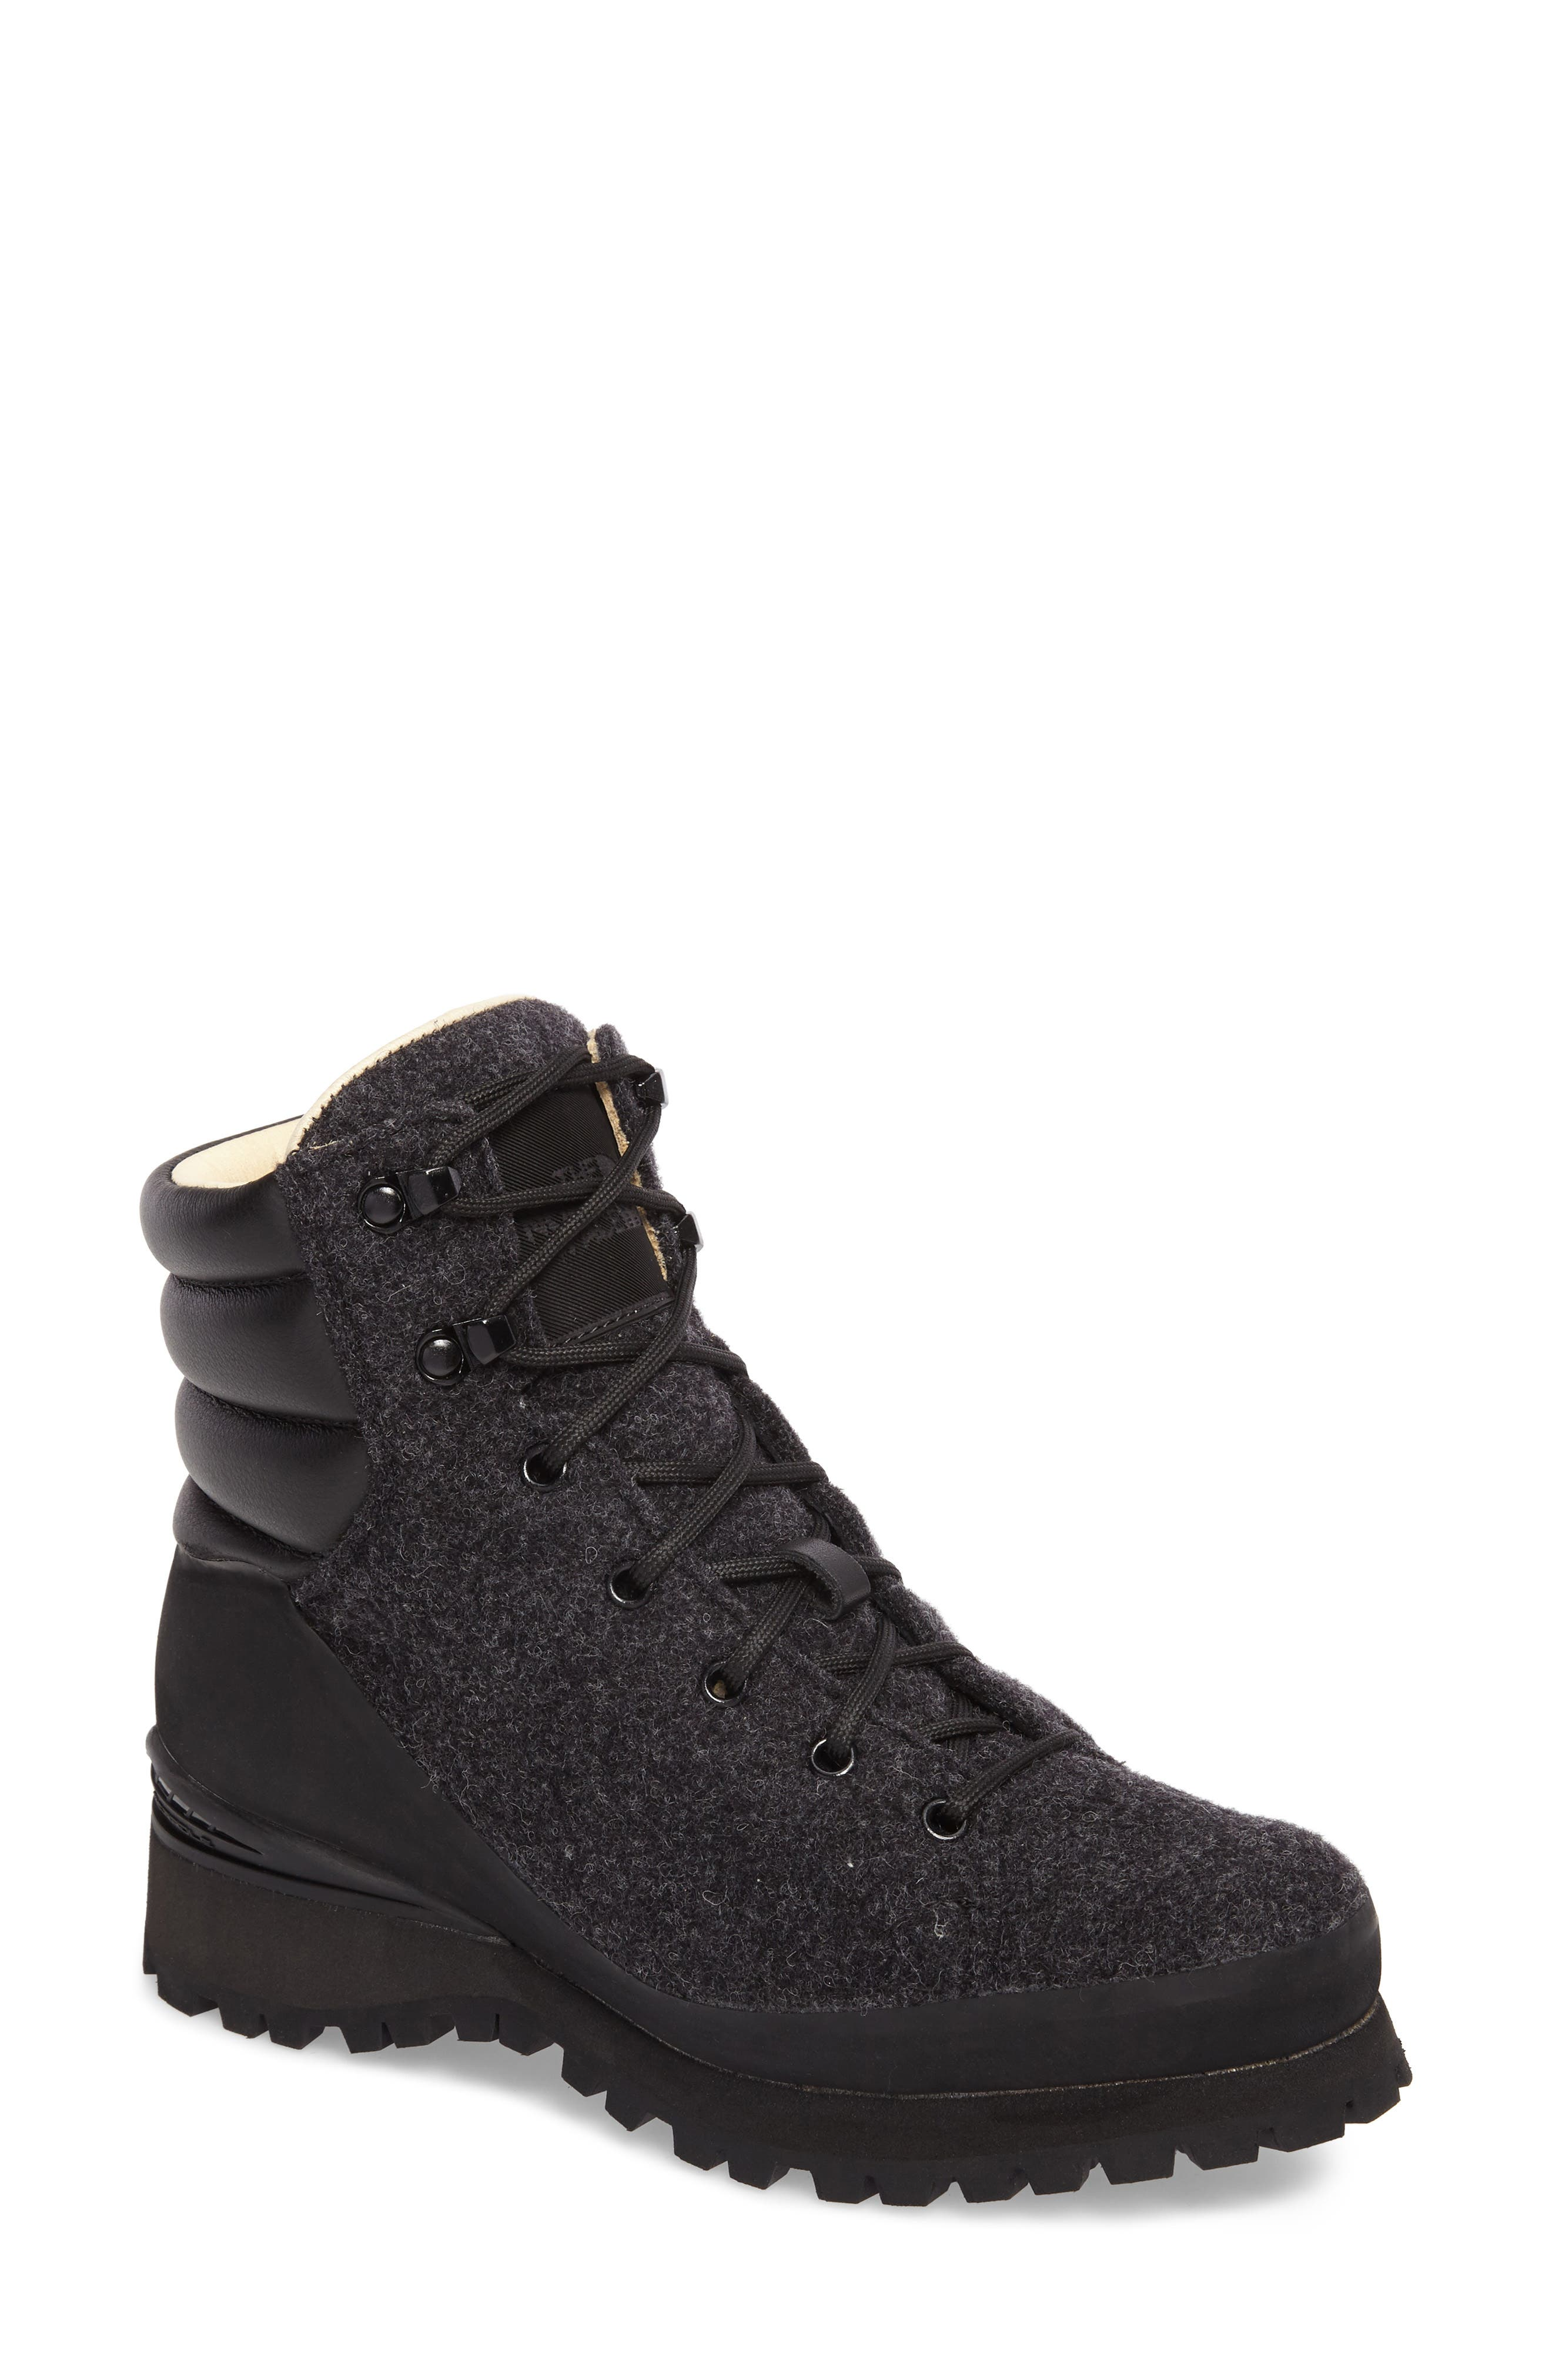 Cryos Hiker Boot,                         Main,                         color,